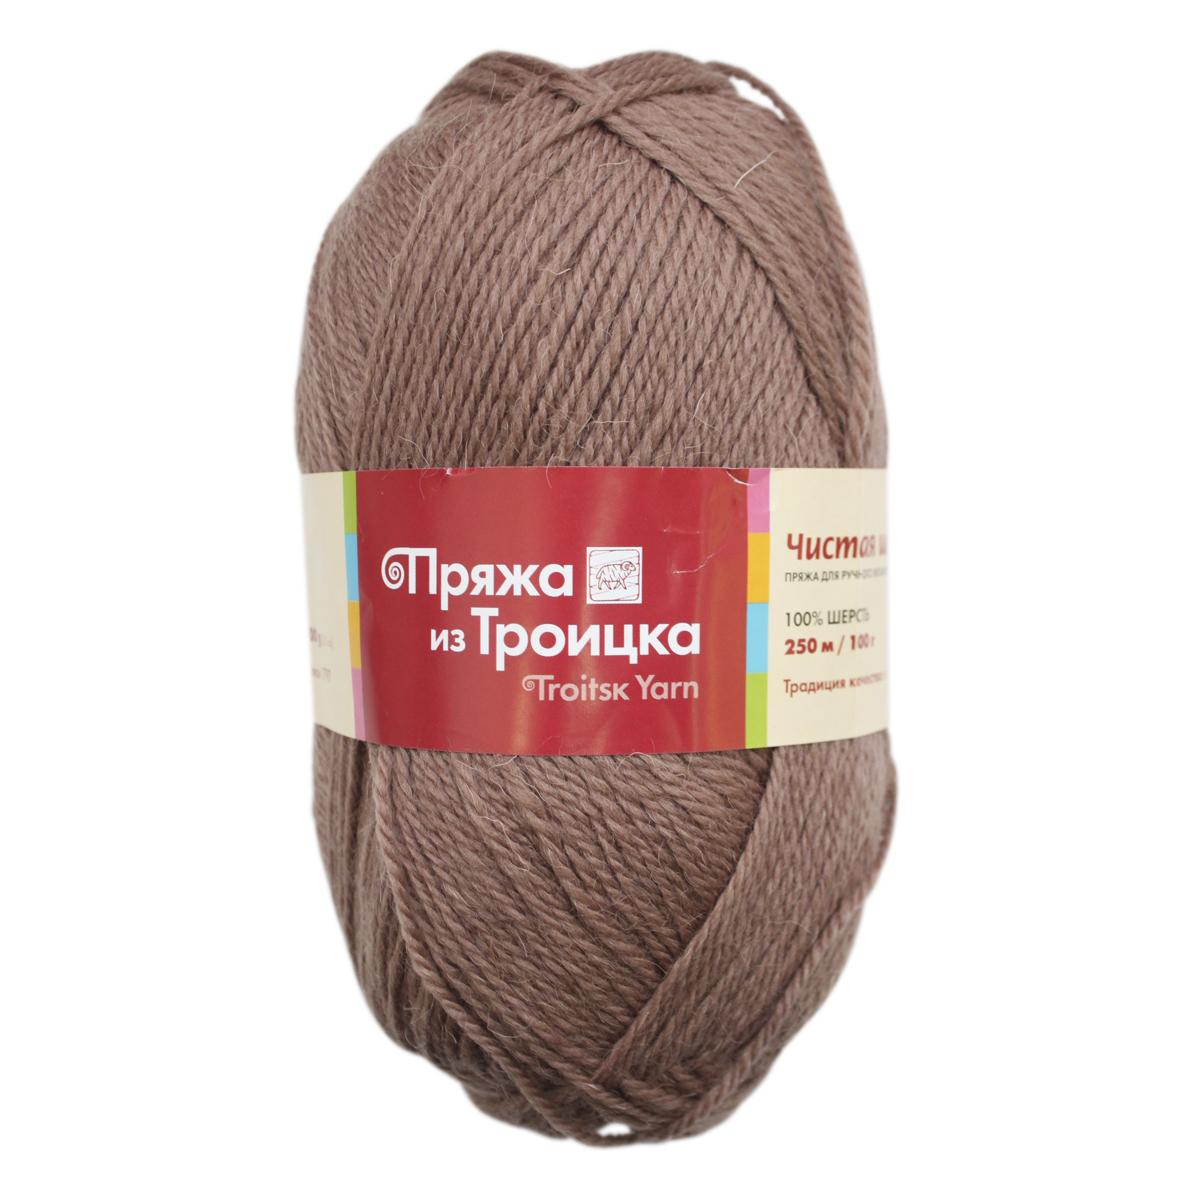 Пряжа для вязания Чистошерстяная, 100 г, 250 м, цвет: 0201 бежевый, 10 шт366003_0201